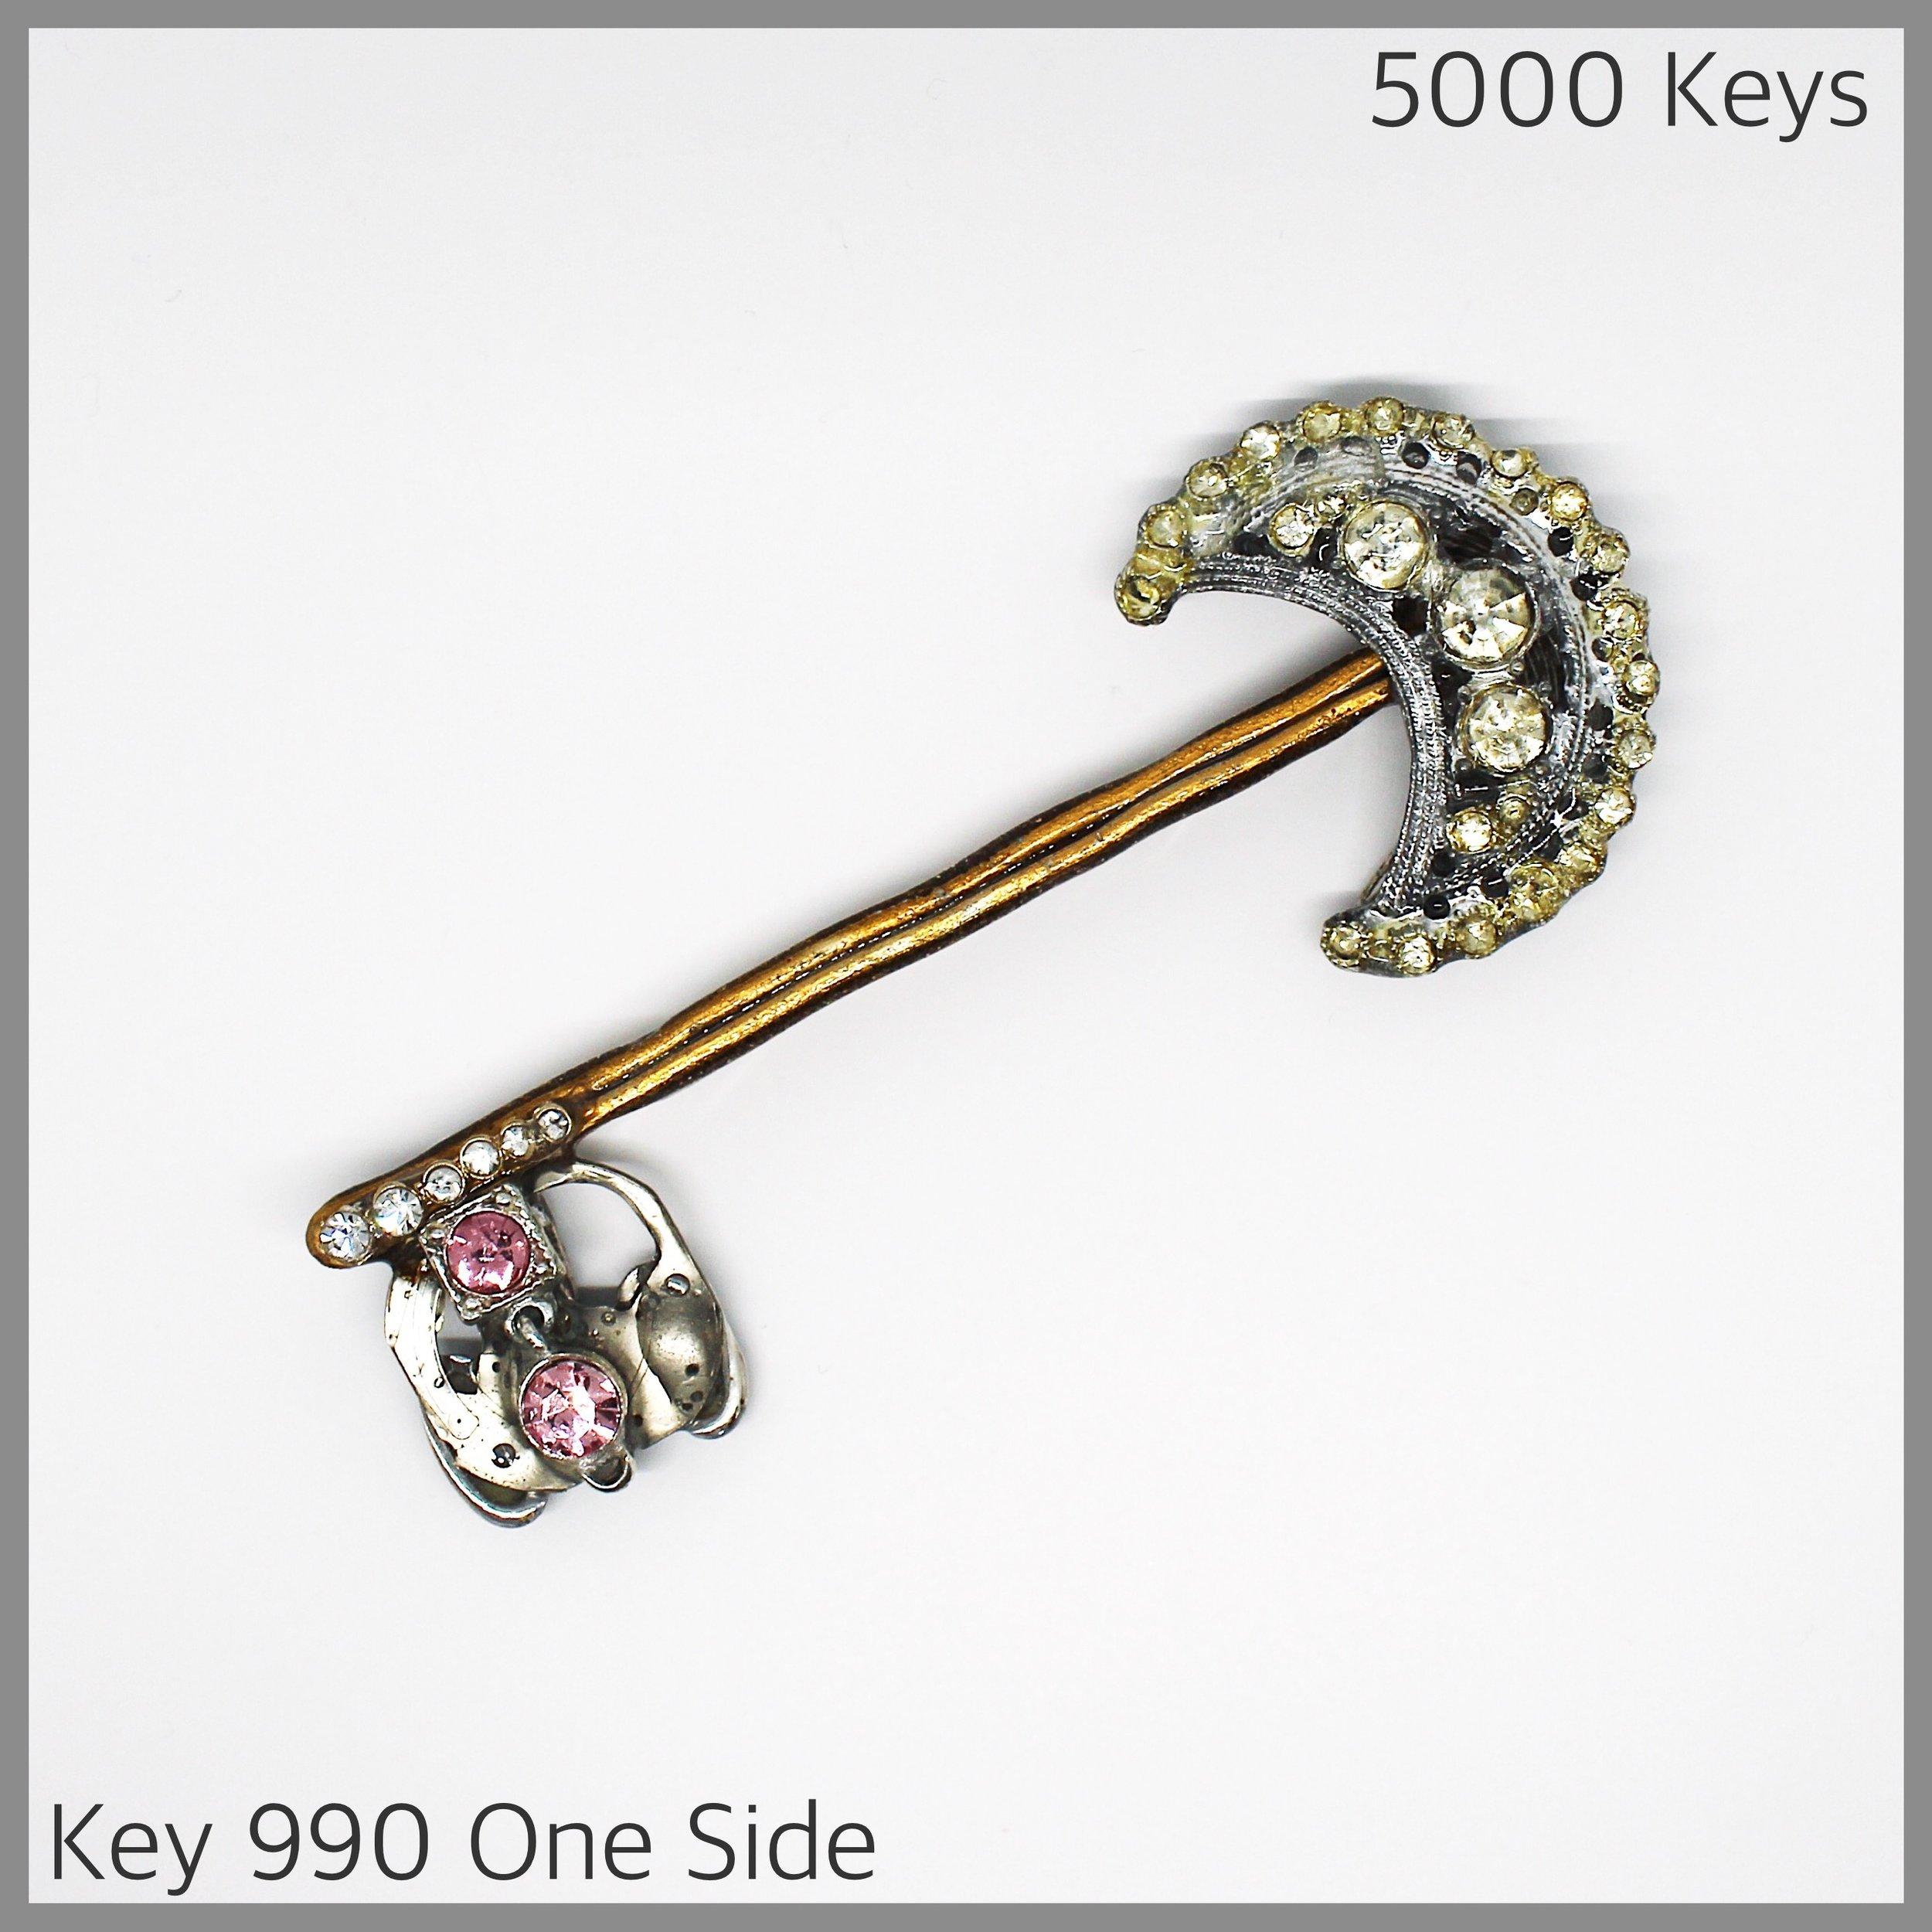 Key 990 one side - 1.JPG